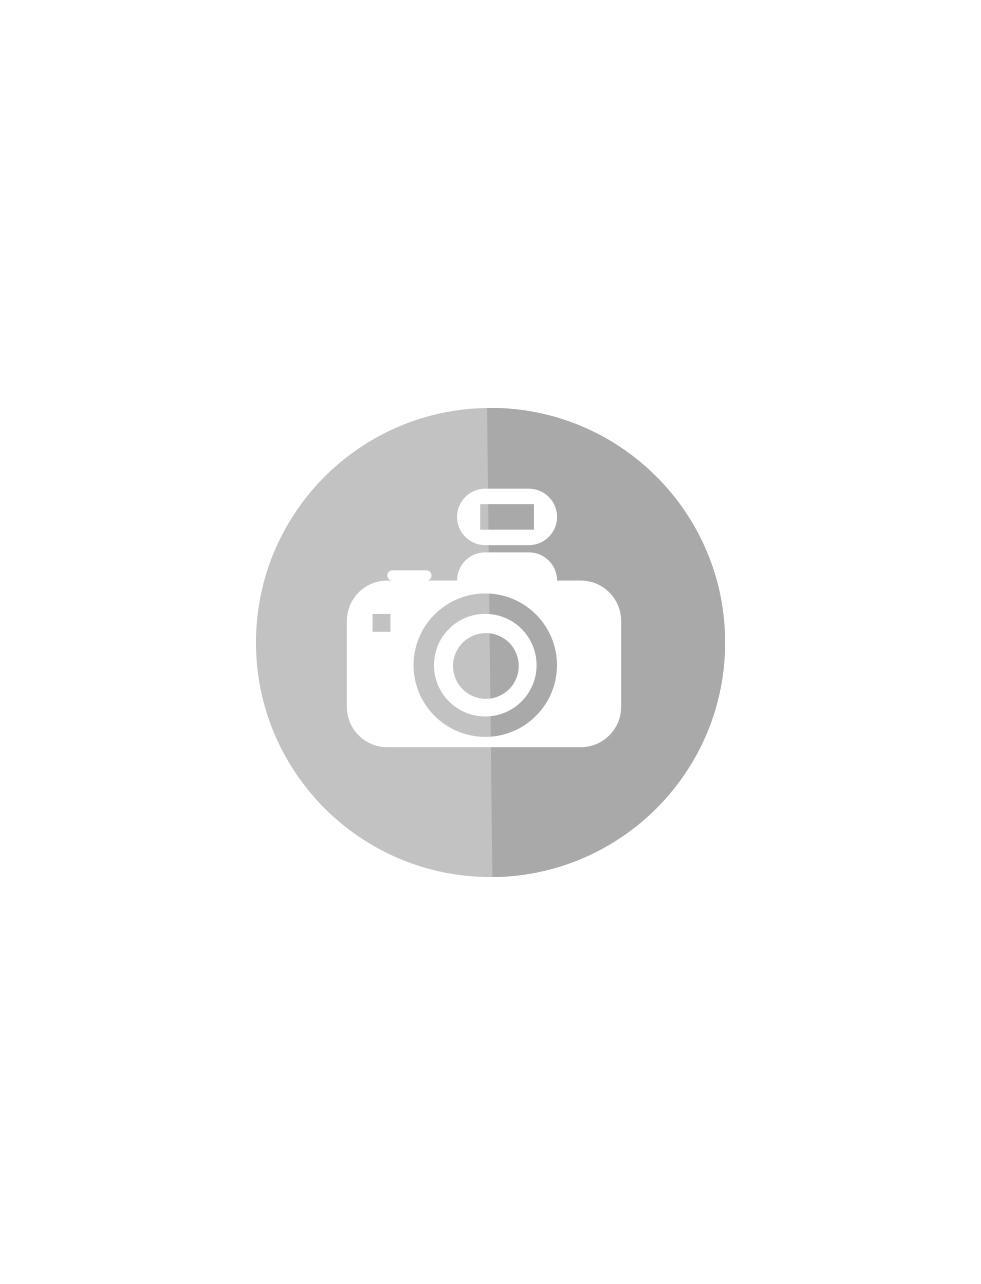 30516940_sparepart/Wasserrad 2teilig